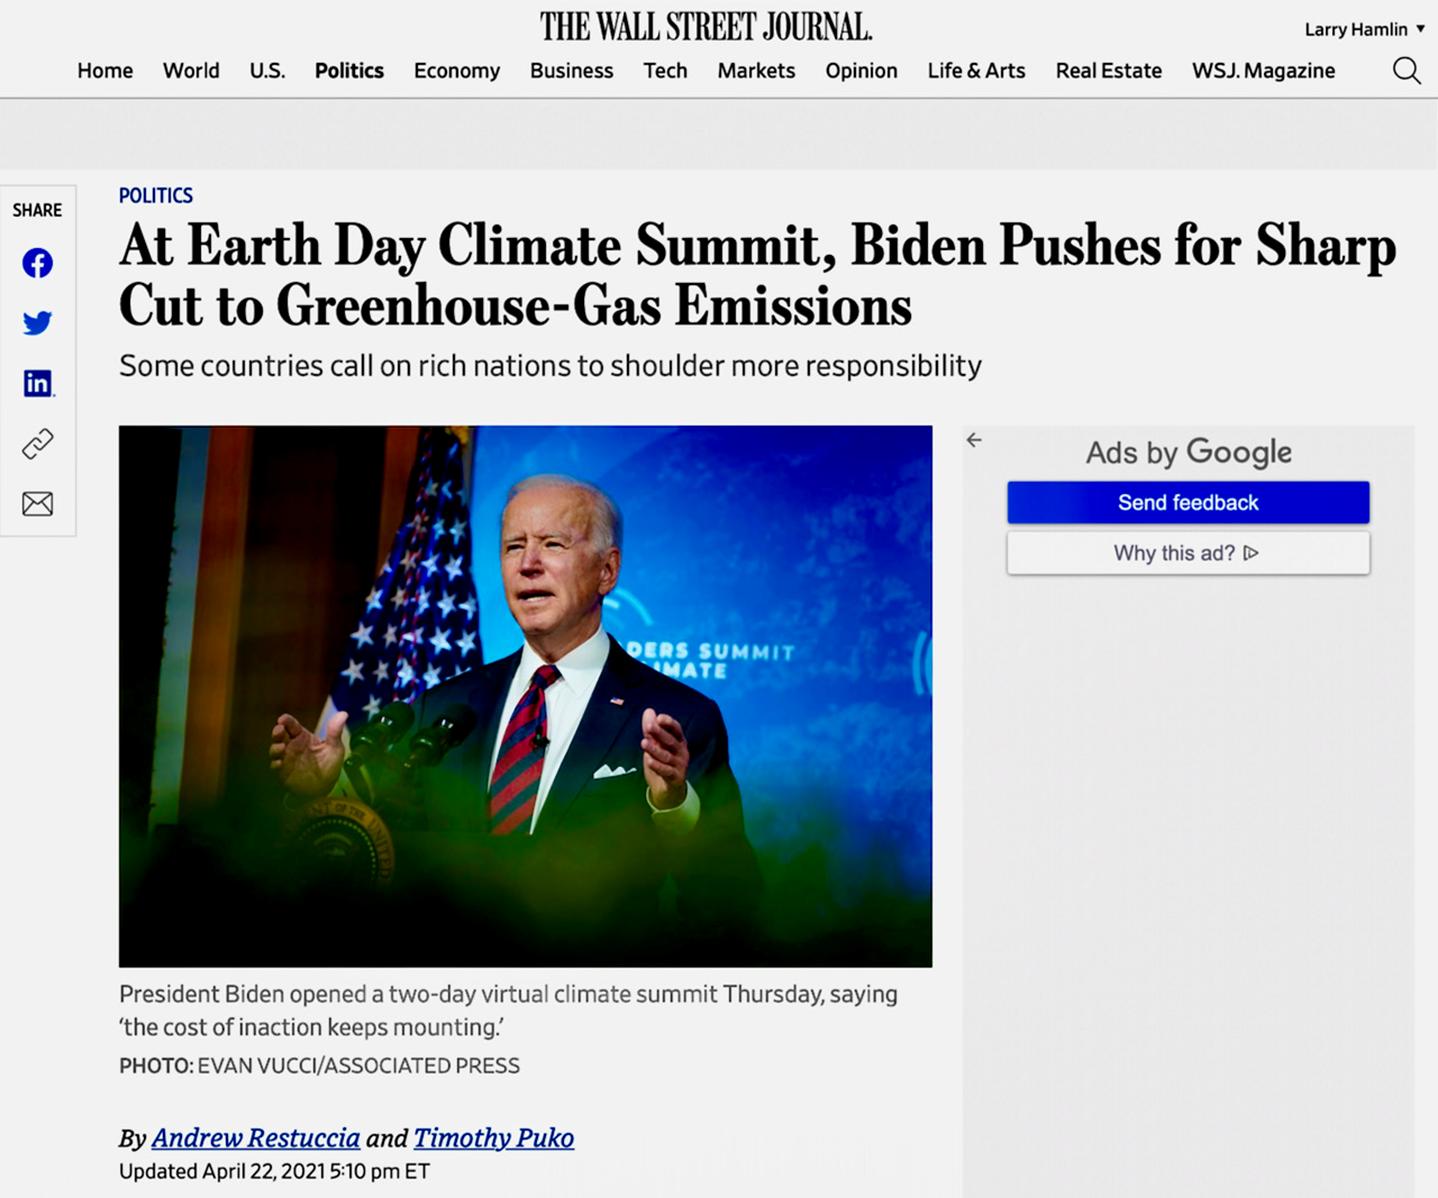 Wall Street Journal hypes Biden's climate alarmist absurd emissions reductions propaganda schemes